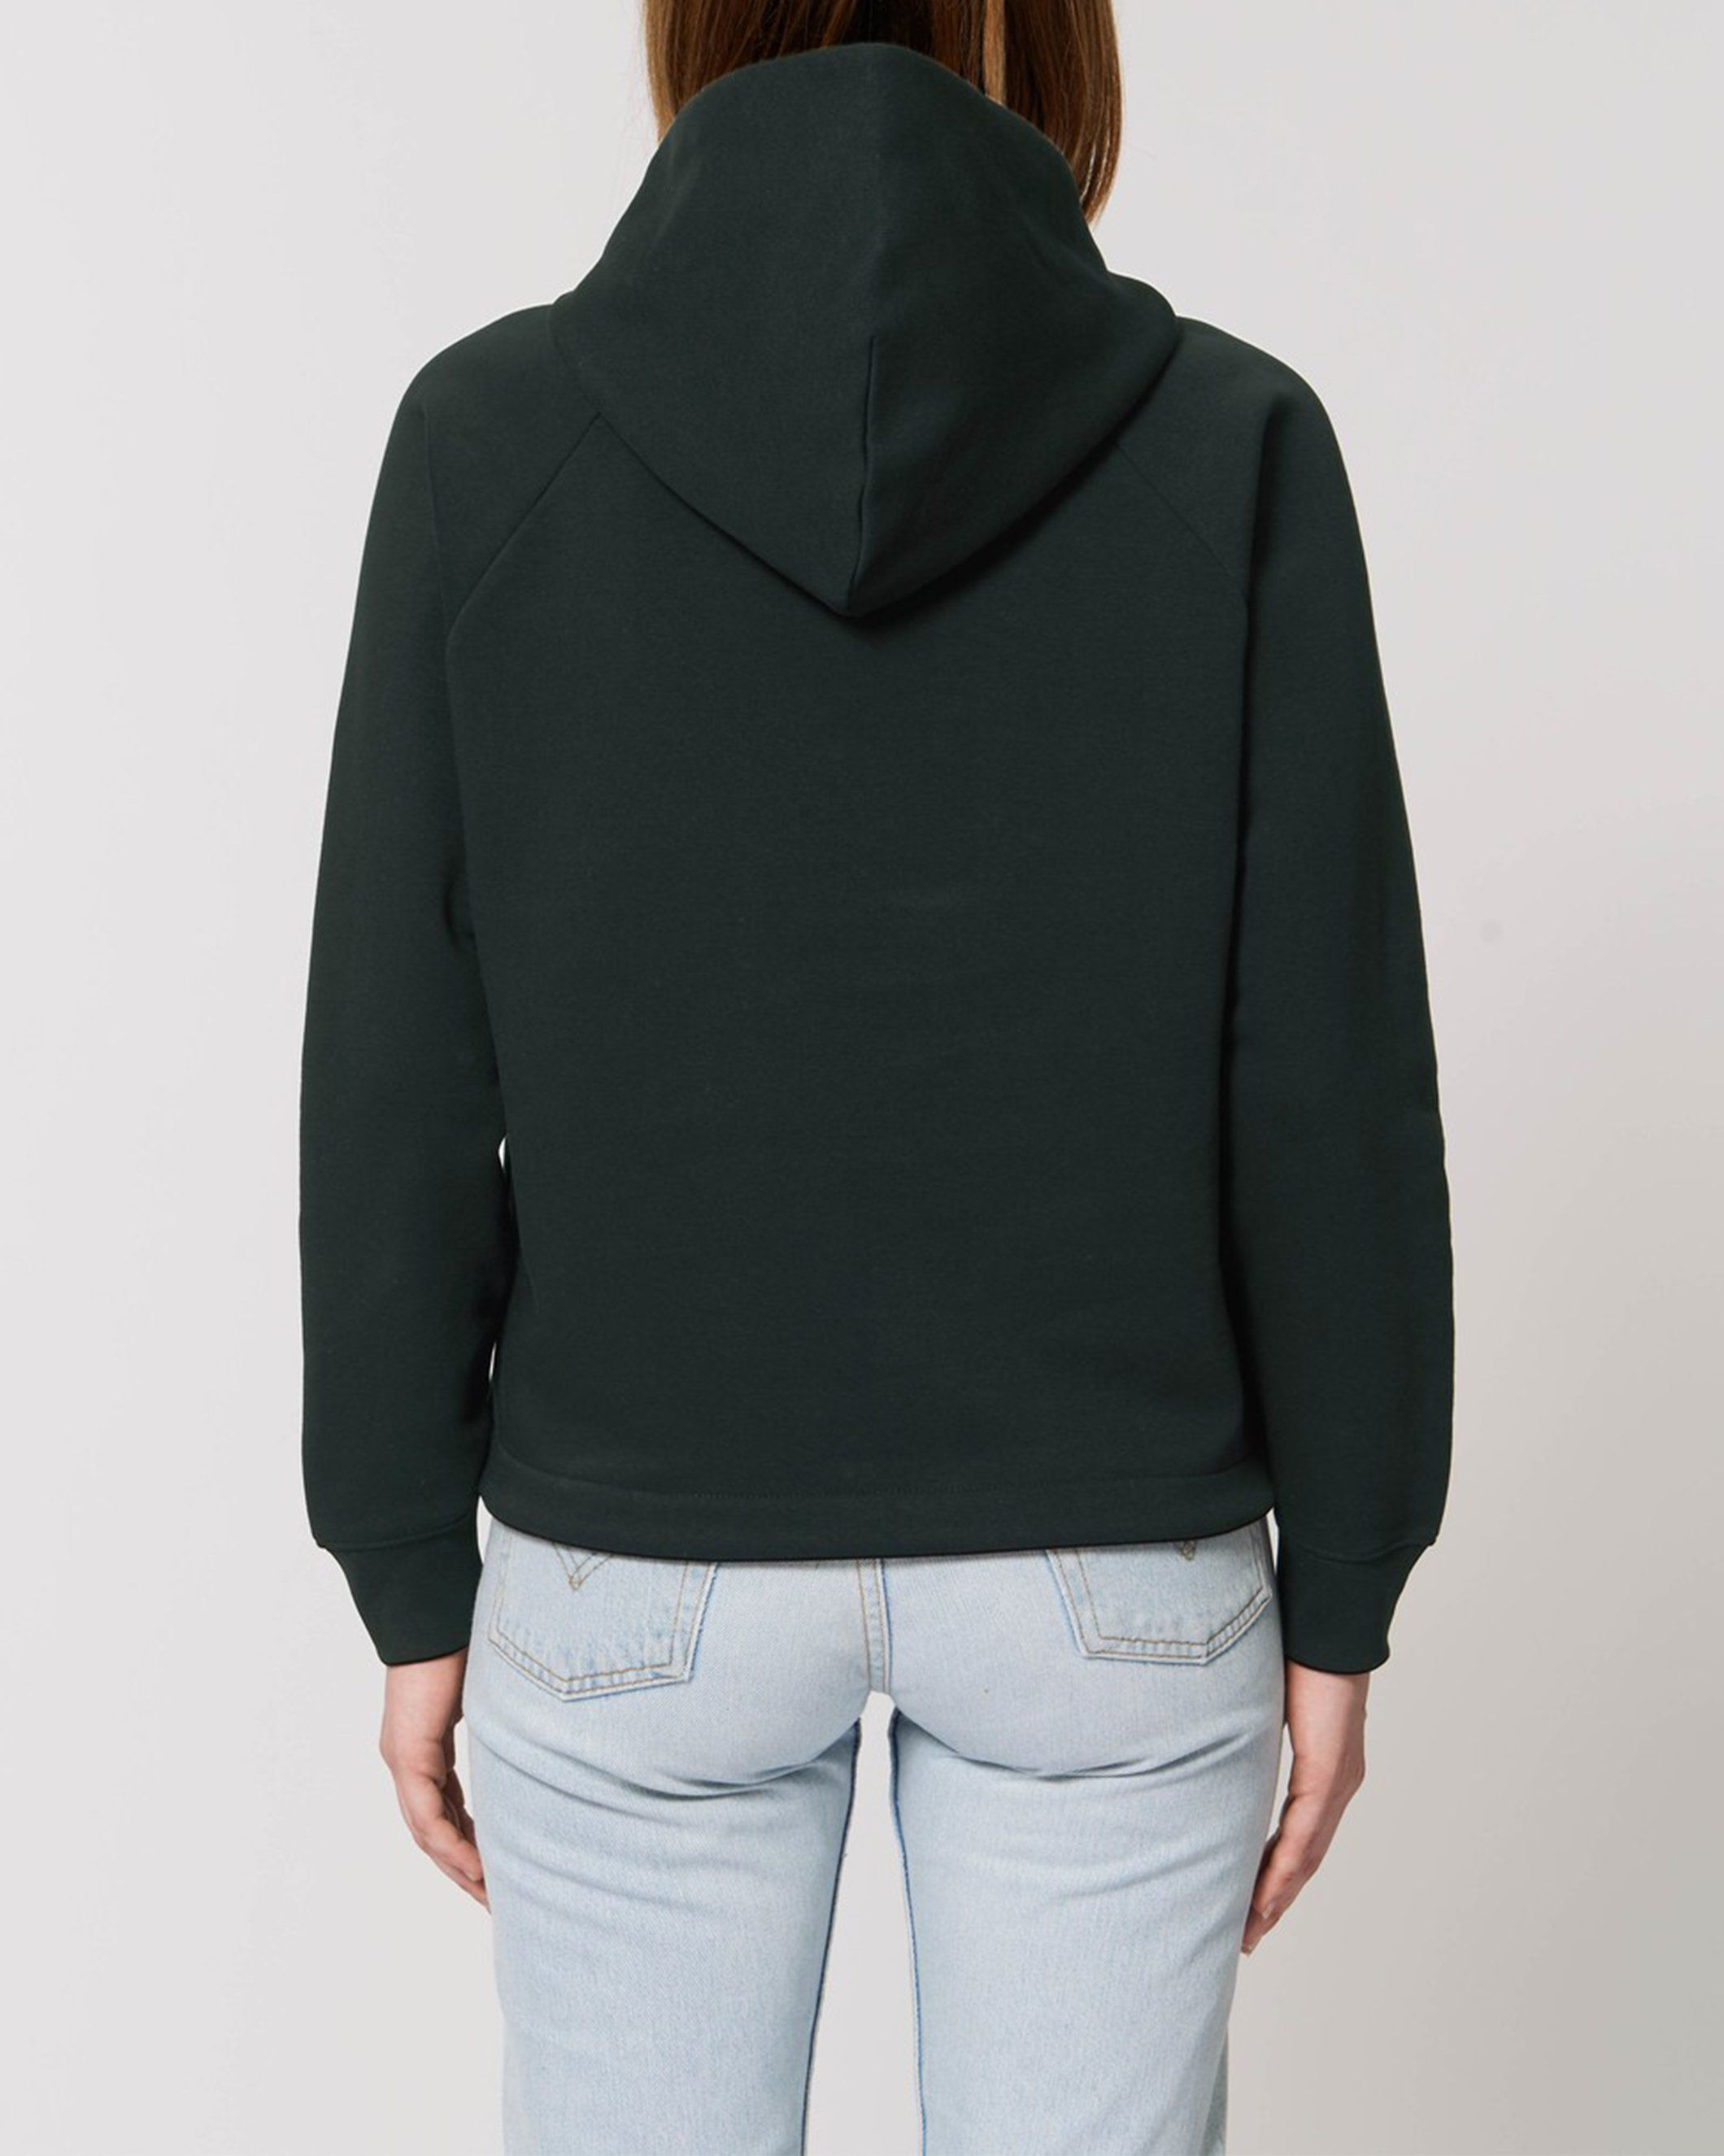 Udana Women's Cropped Hoodie in Black